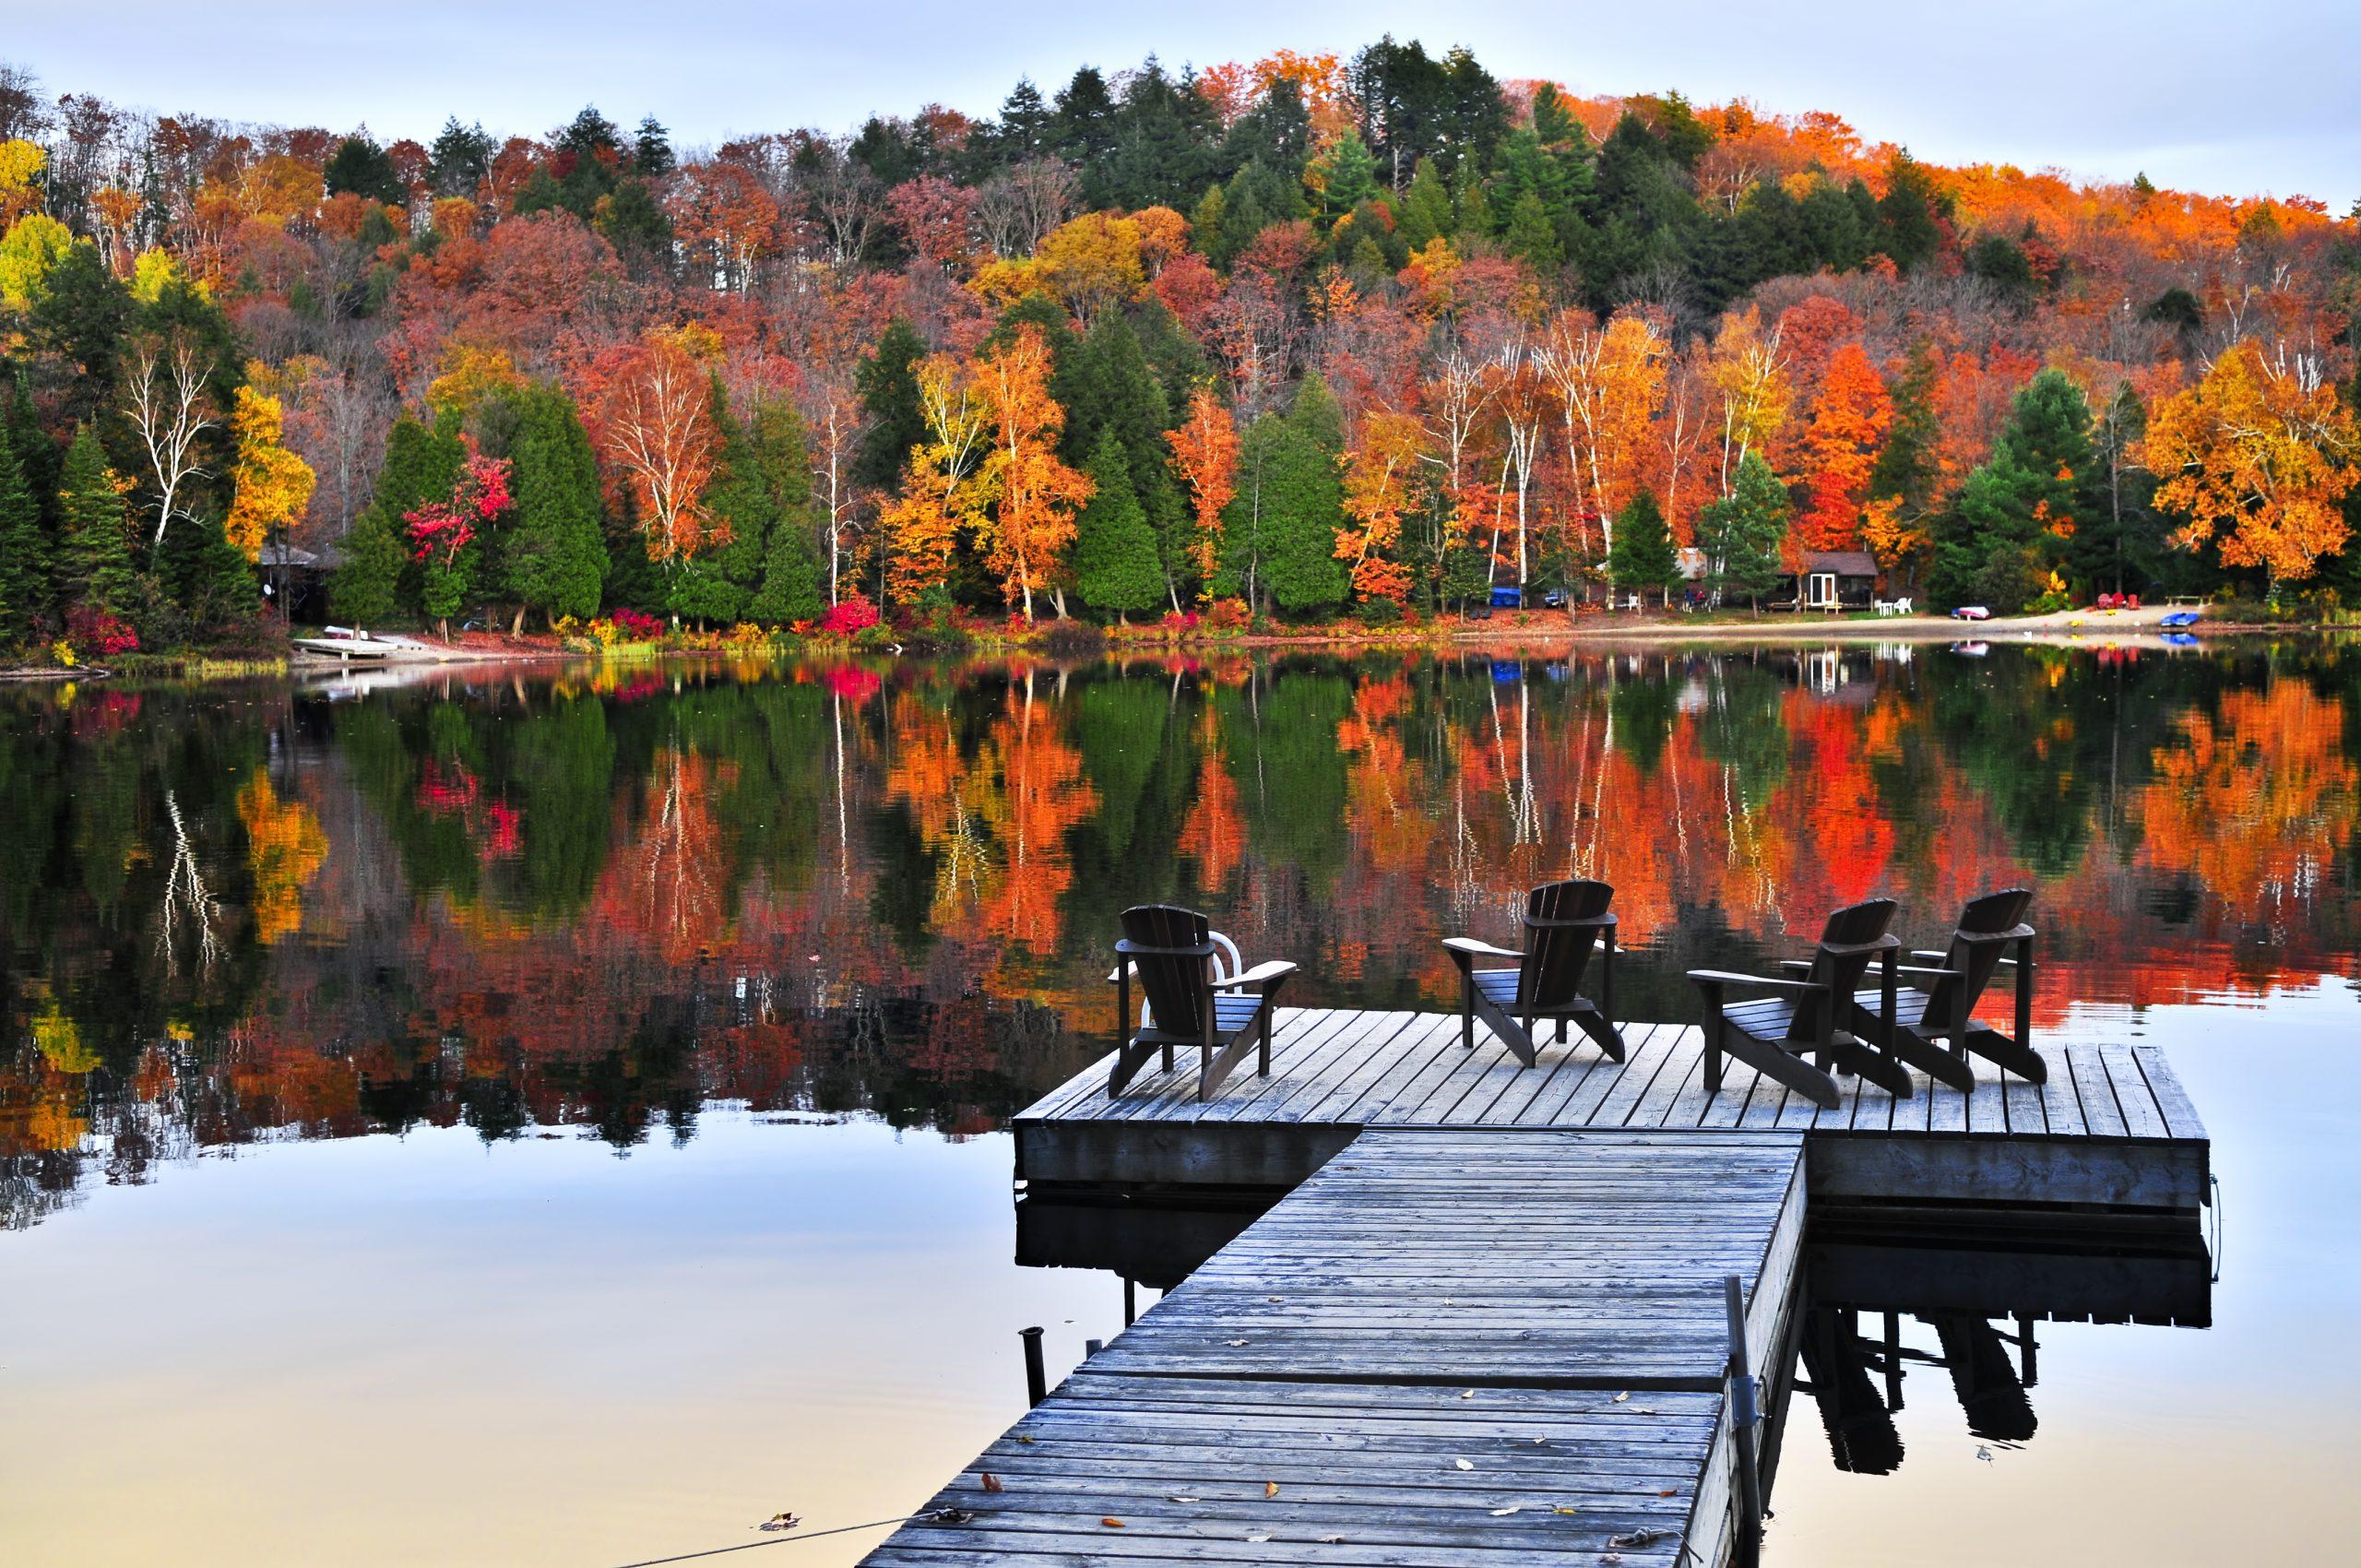 10 Badass Reasons why I love the Fall season